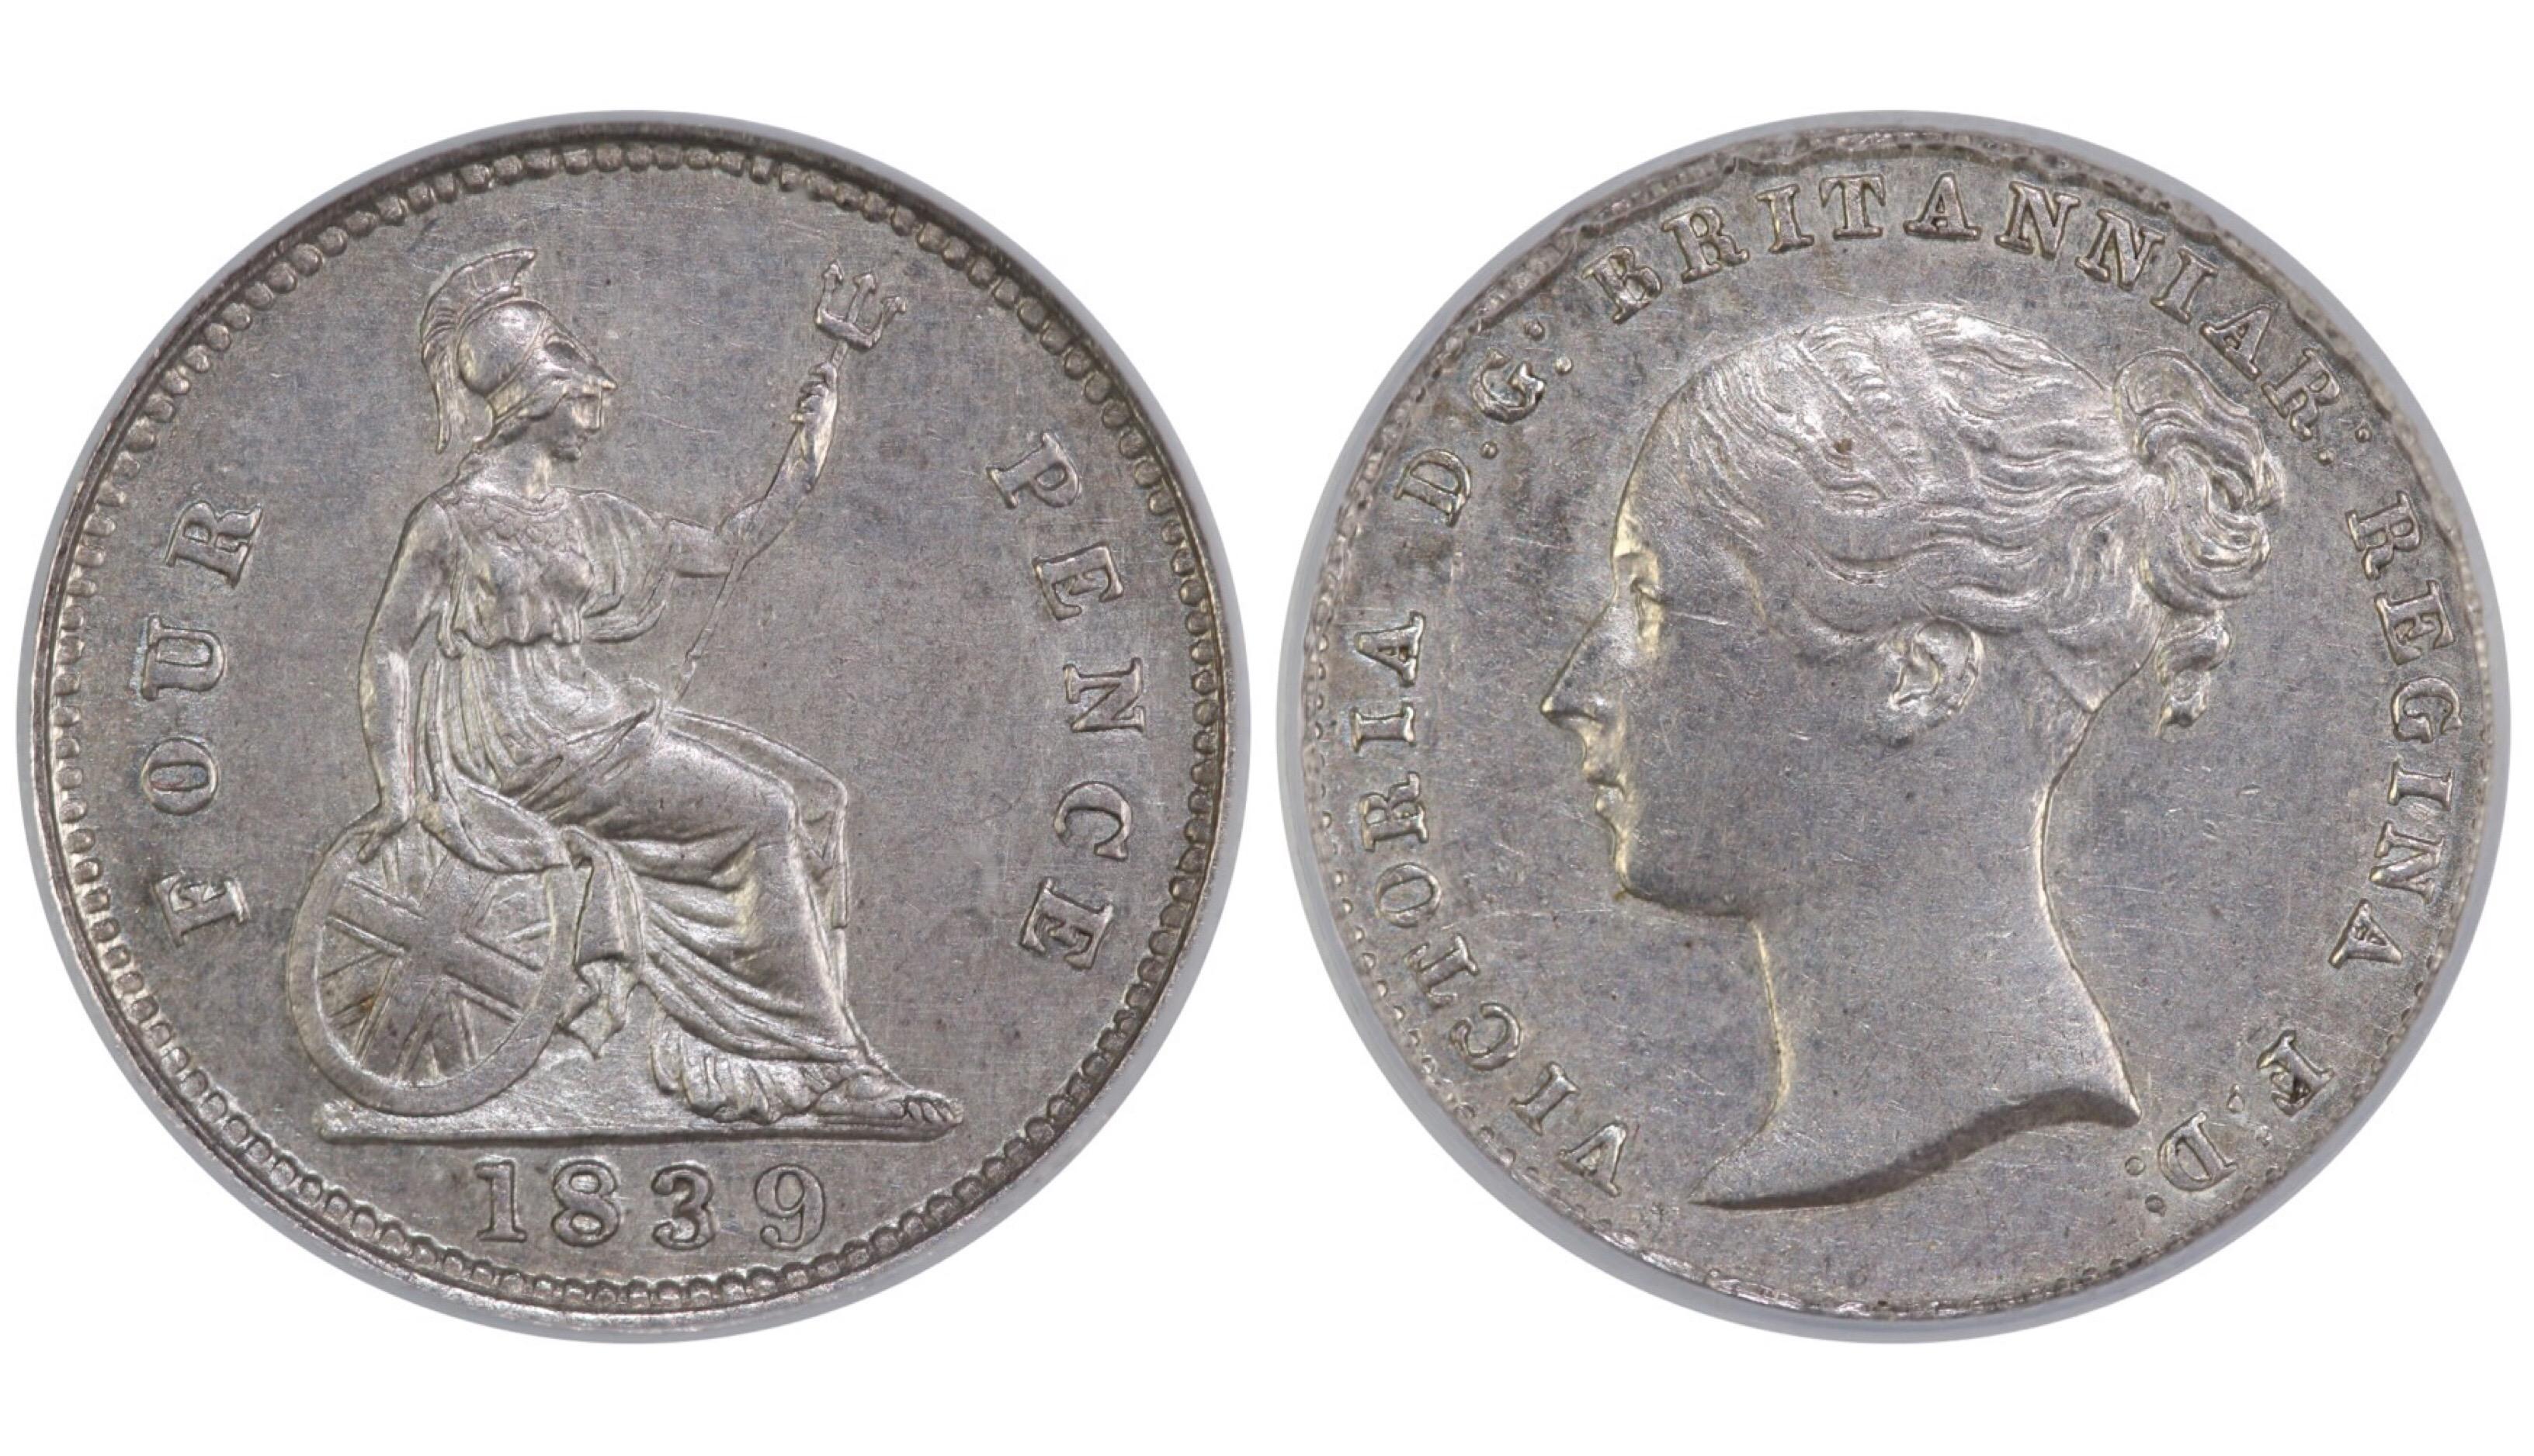 1839 Groat, CGS 55, Victoria, ESC 1932, UIN 33193, Sold at auction via FB